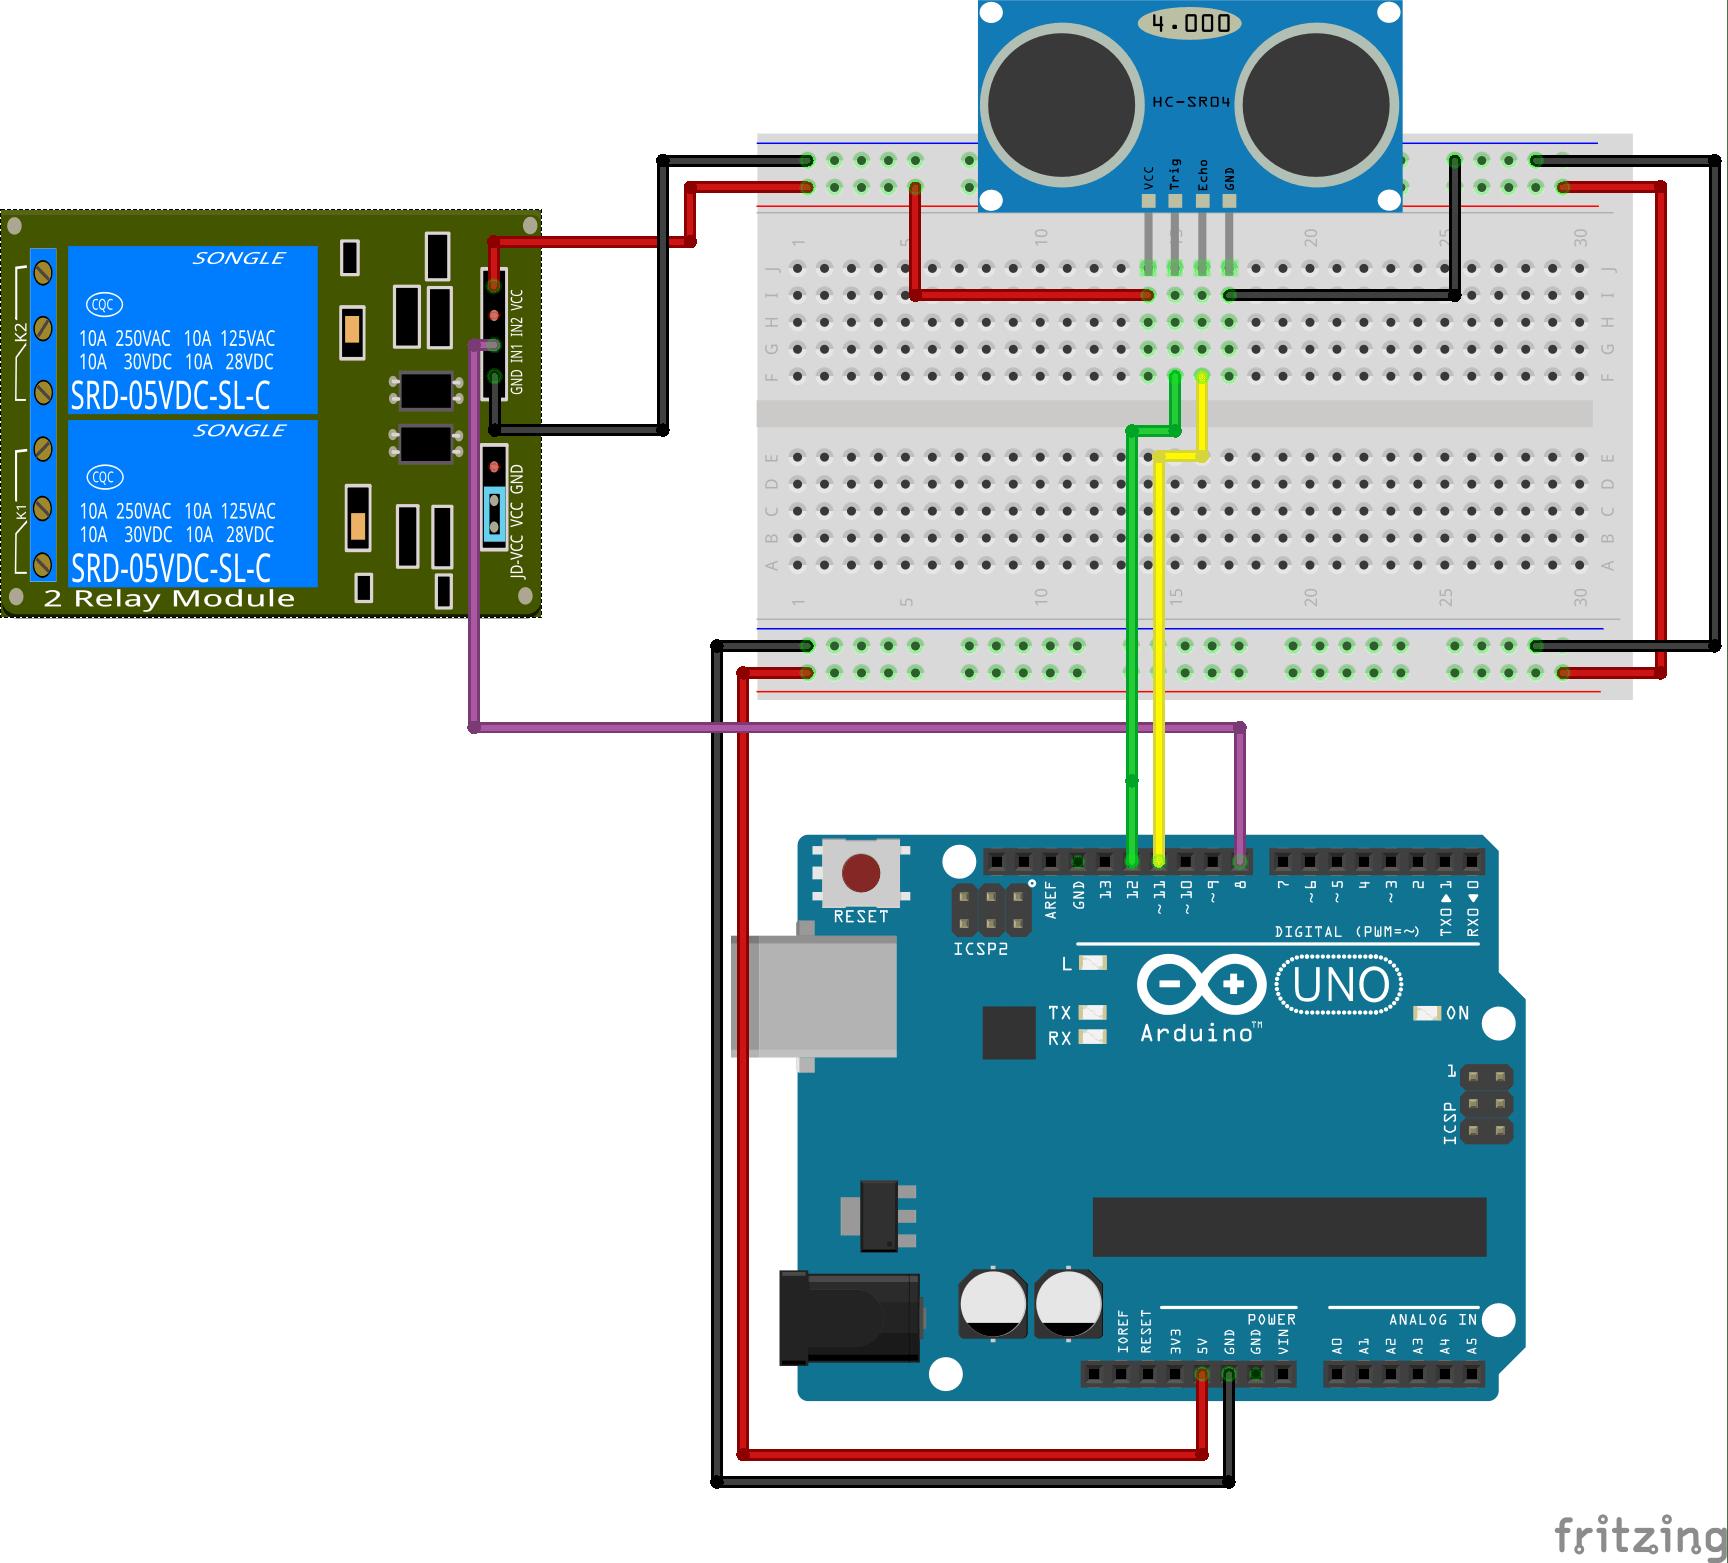 medium resolution of leviton ceiling occupancy sensor wiring diagram leviton photo sensor wiring diagram watt stopper ls 102